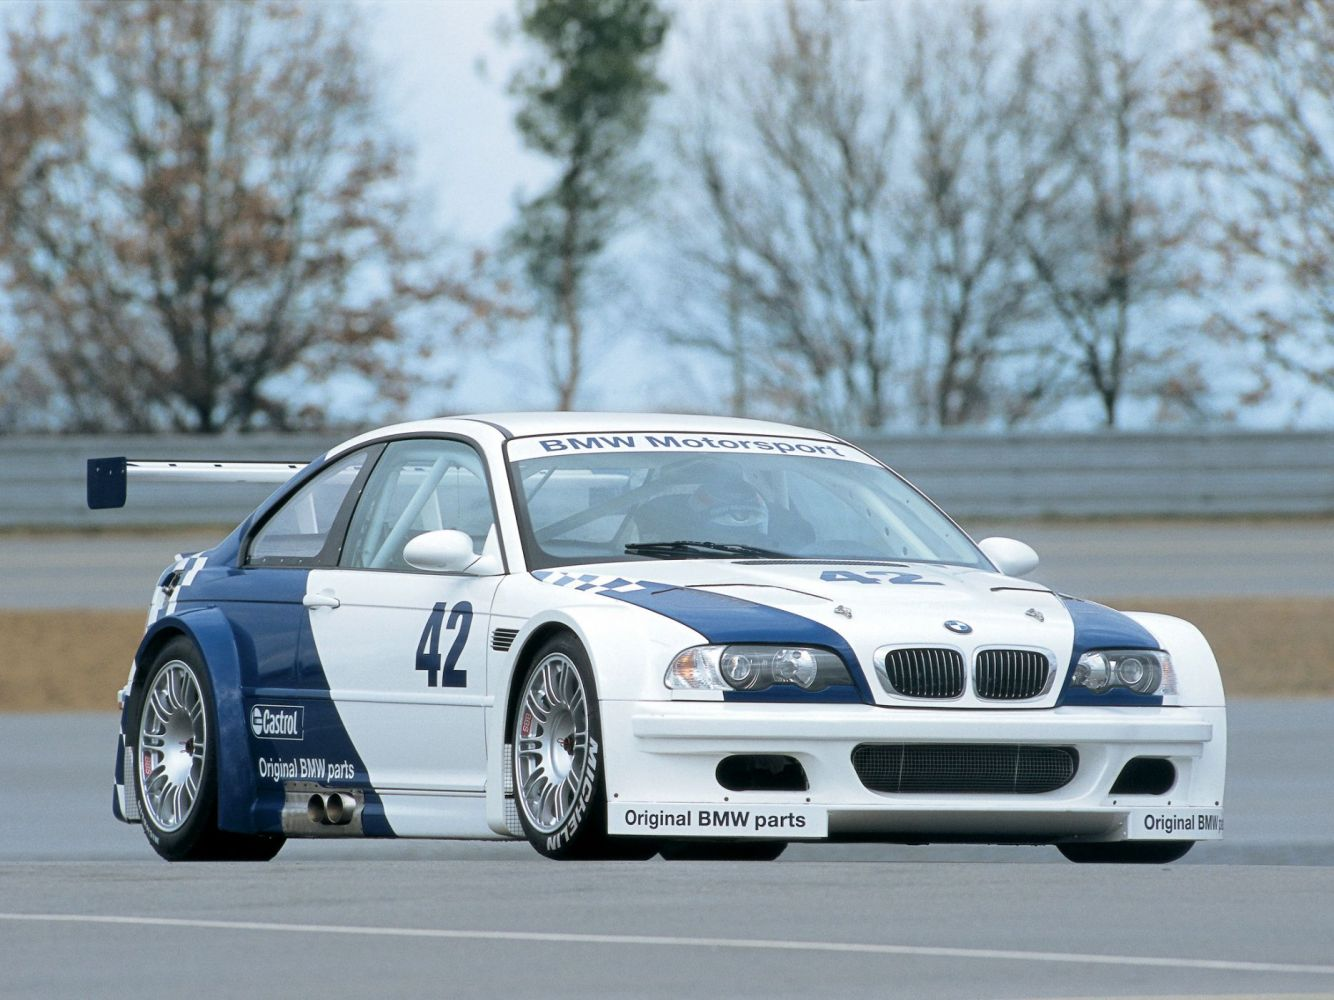 BMW-M3-GTR-Race-Car-01-4.jpg